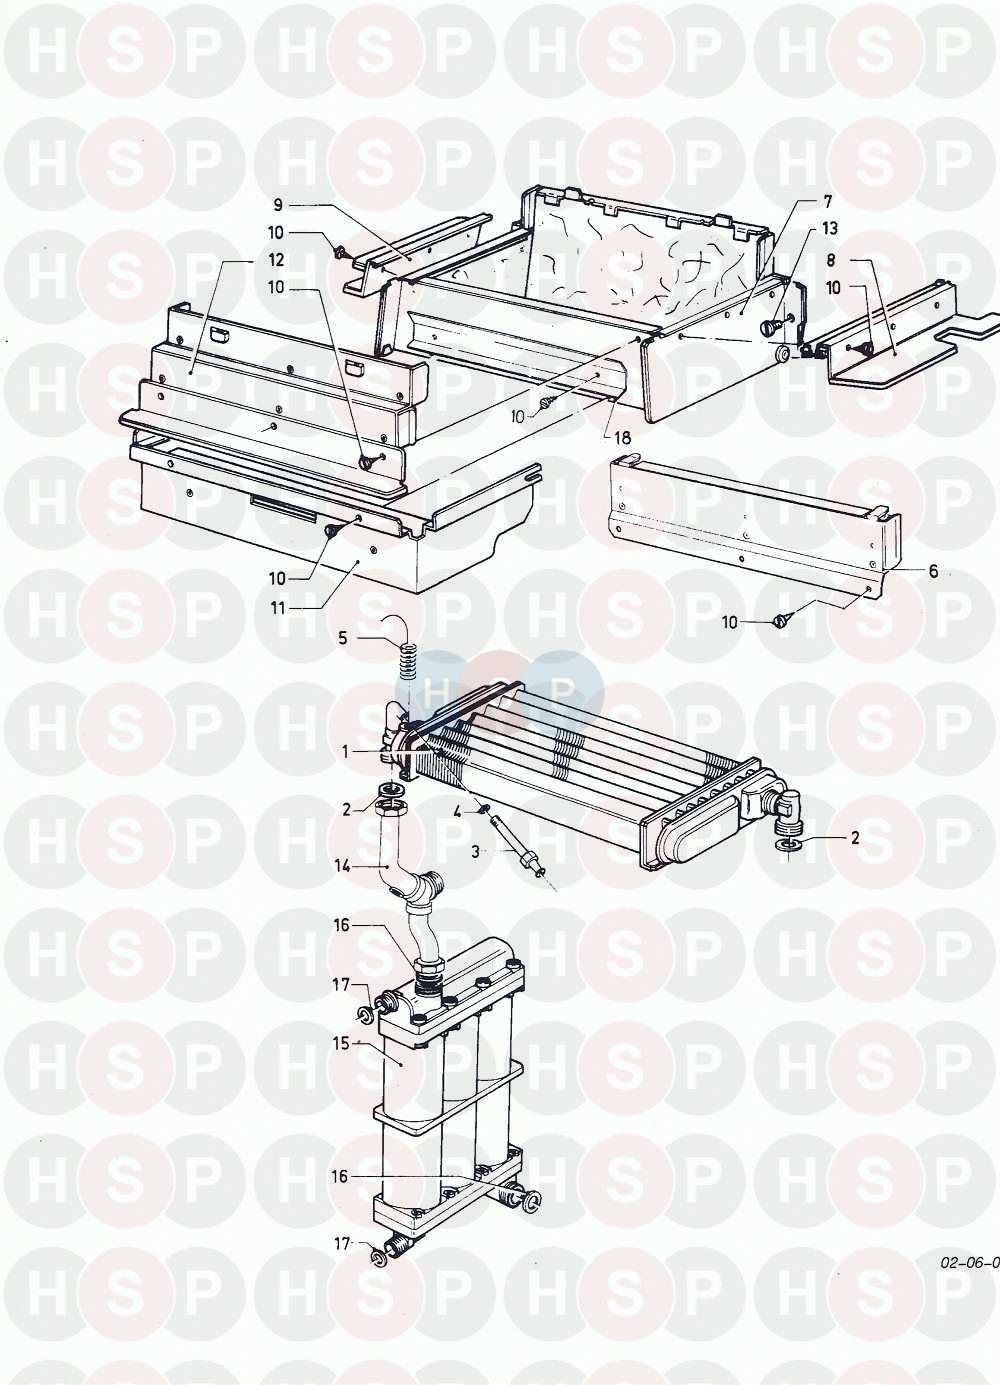 Vaillant COMBI COMPACT FF VCW 282 E 1988-1995 Appliance